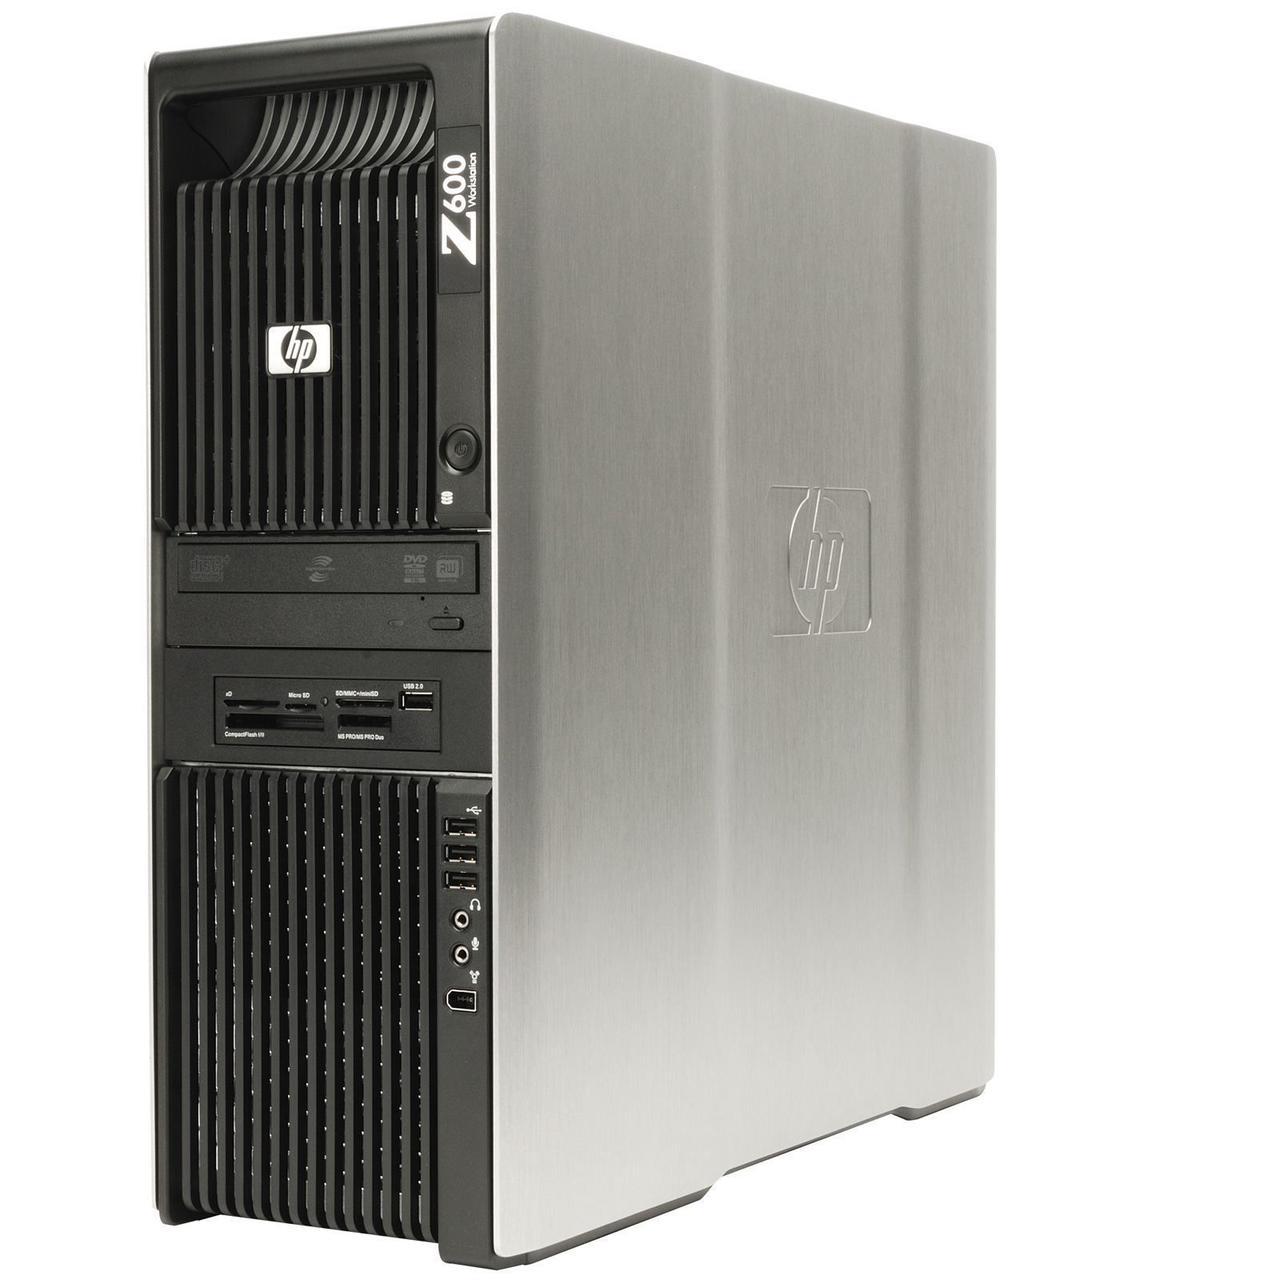 Сервер, Workstation, HP z600, 2x Intel Xeon x5650, 12 ядер по 3,06 GHz, 16 Гб ОЗУ, HDD 0 Гб, видео 256 Мб